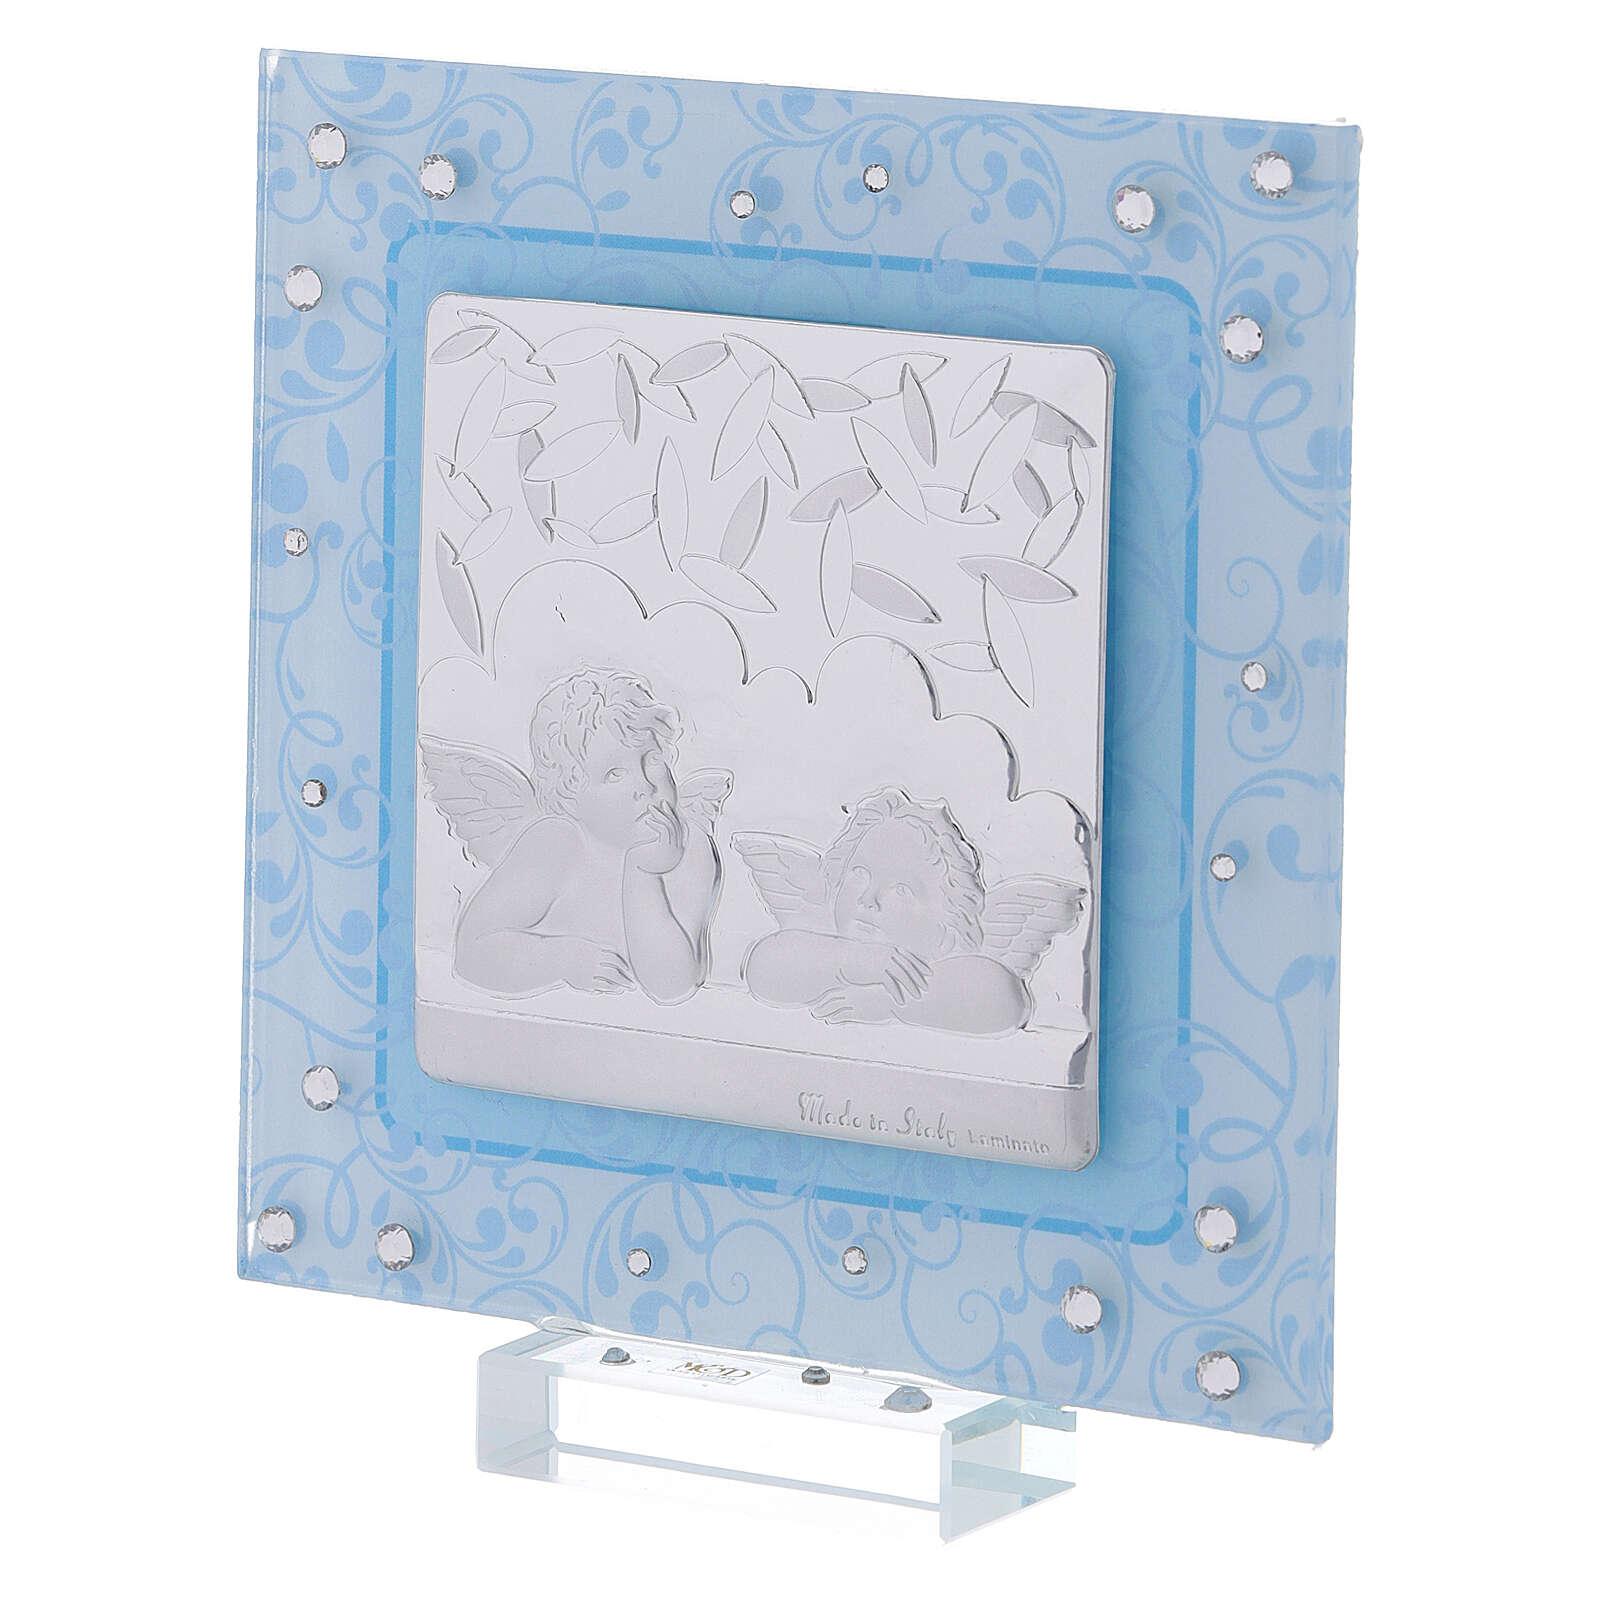 Cuadrito Bautismo ángeles de Rafael celeste 12x12 cm 3